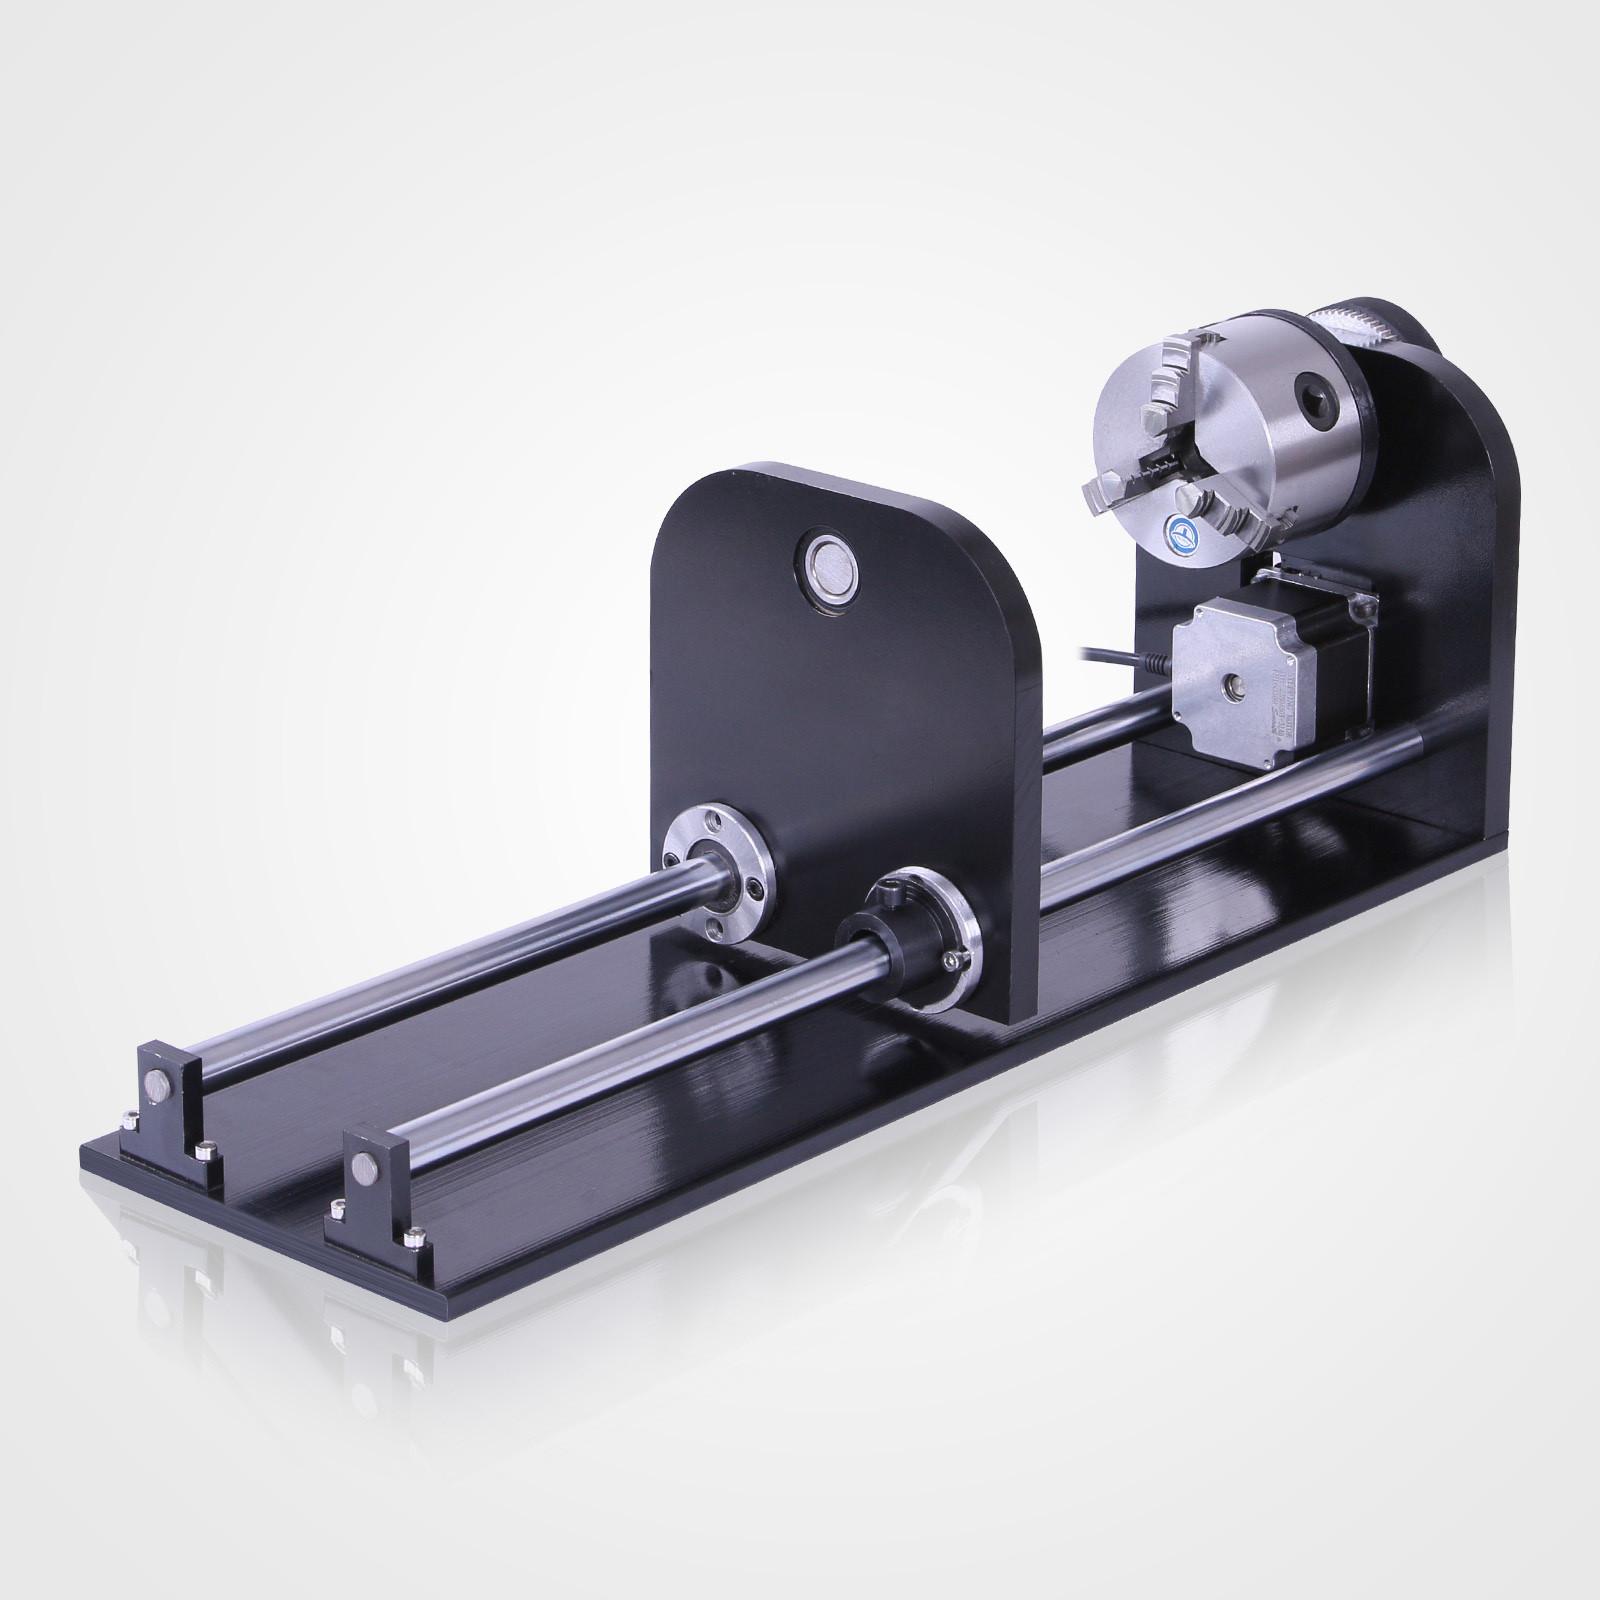 3d laser engraving machine ebay